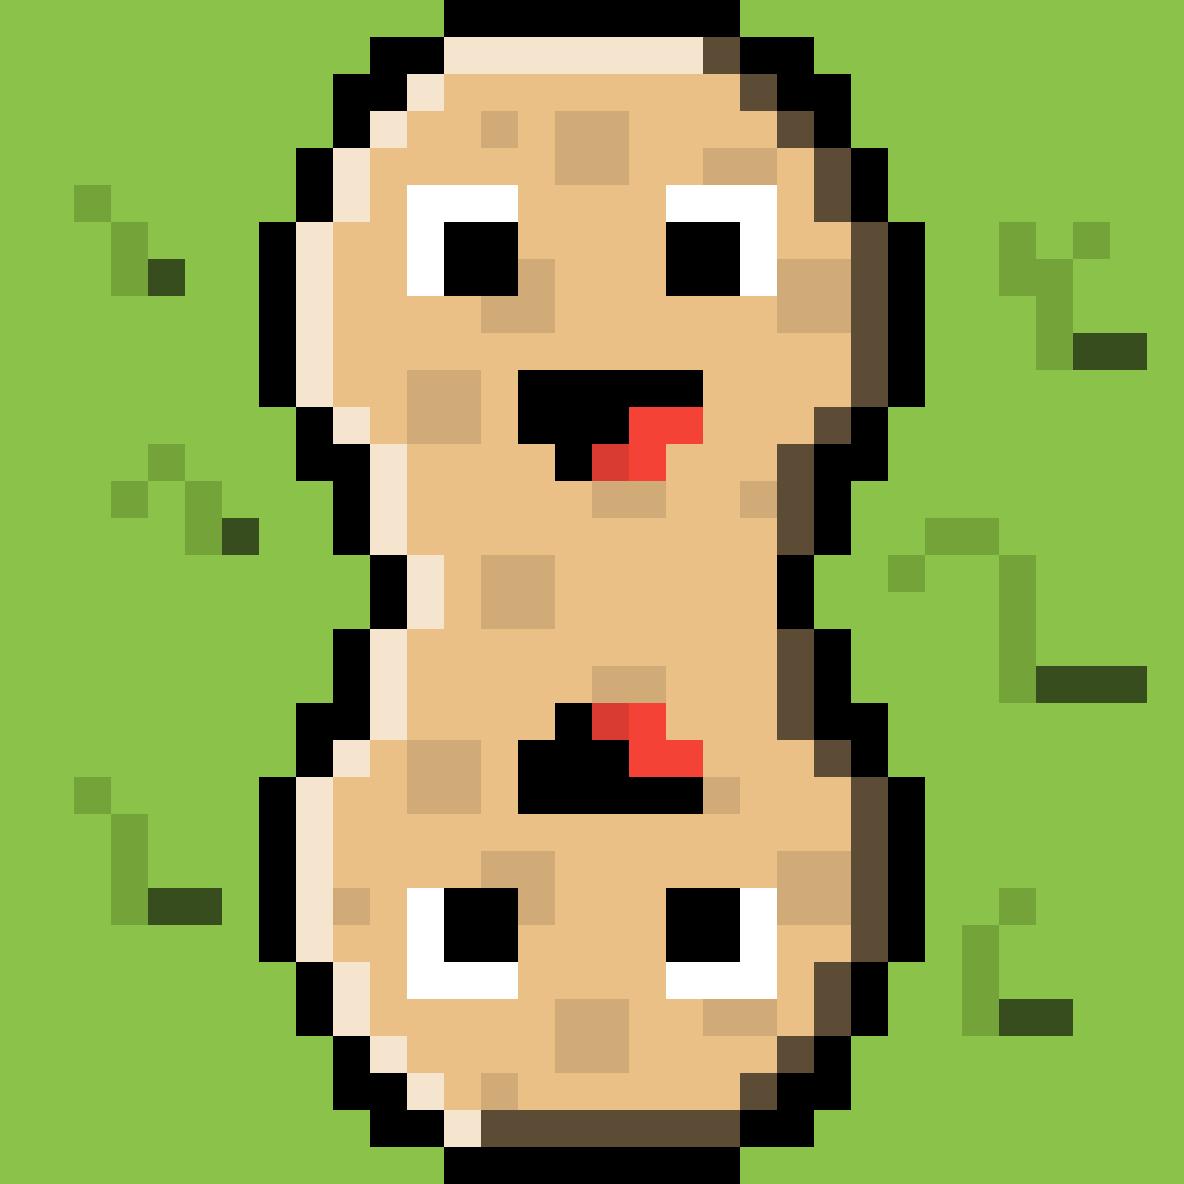 Peanut by Lil-G